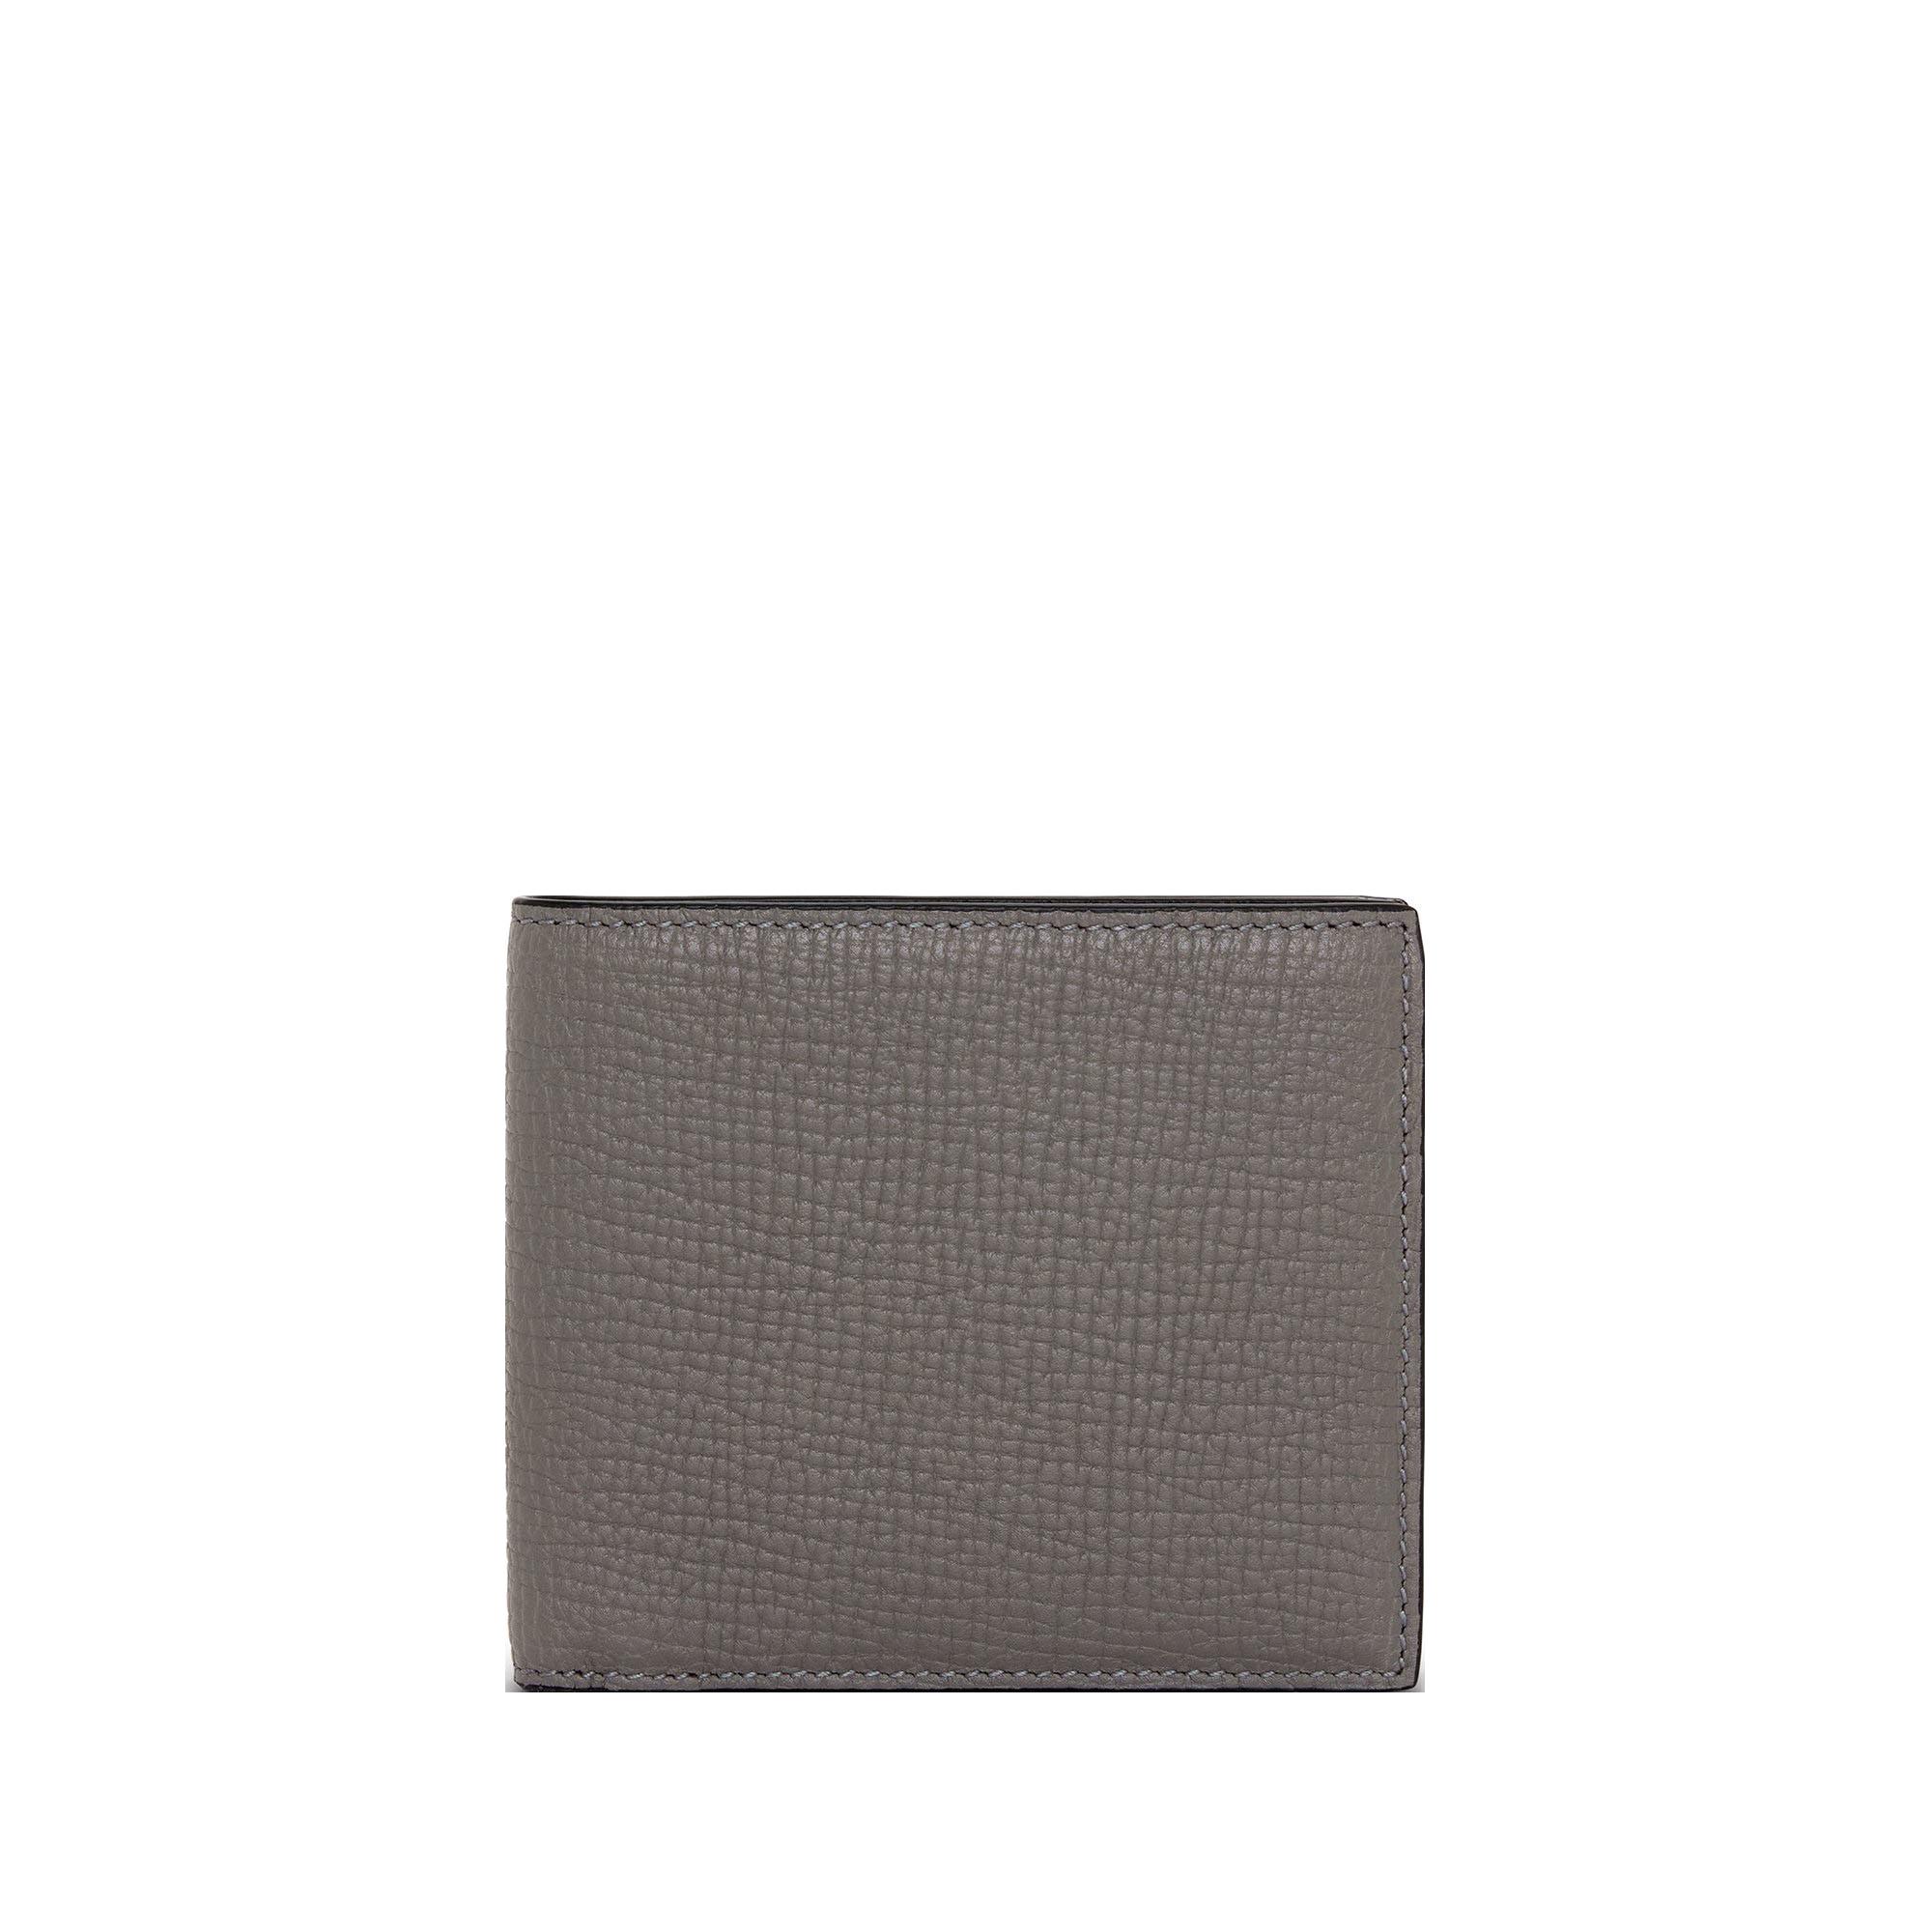 Smythson Dark Steel Ludlow Leather Six Card Wallet Front